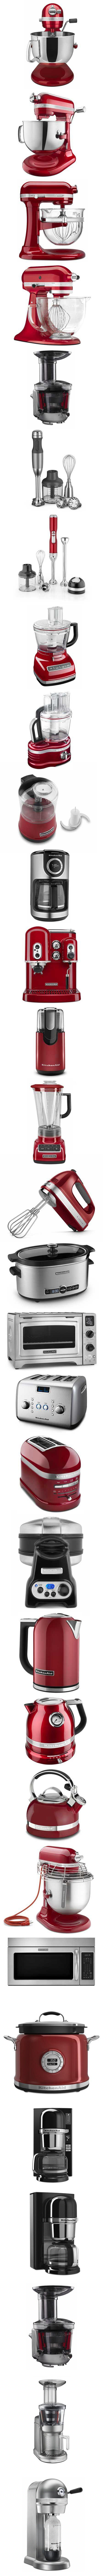 KitchenAid, robot de cocina complemento ideal a la termomix